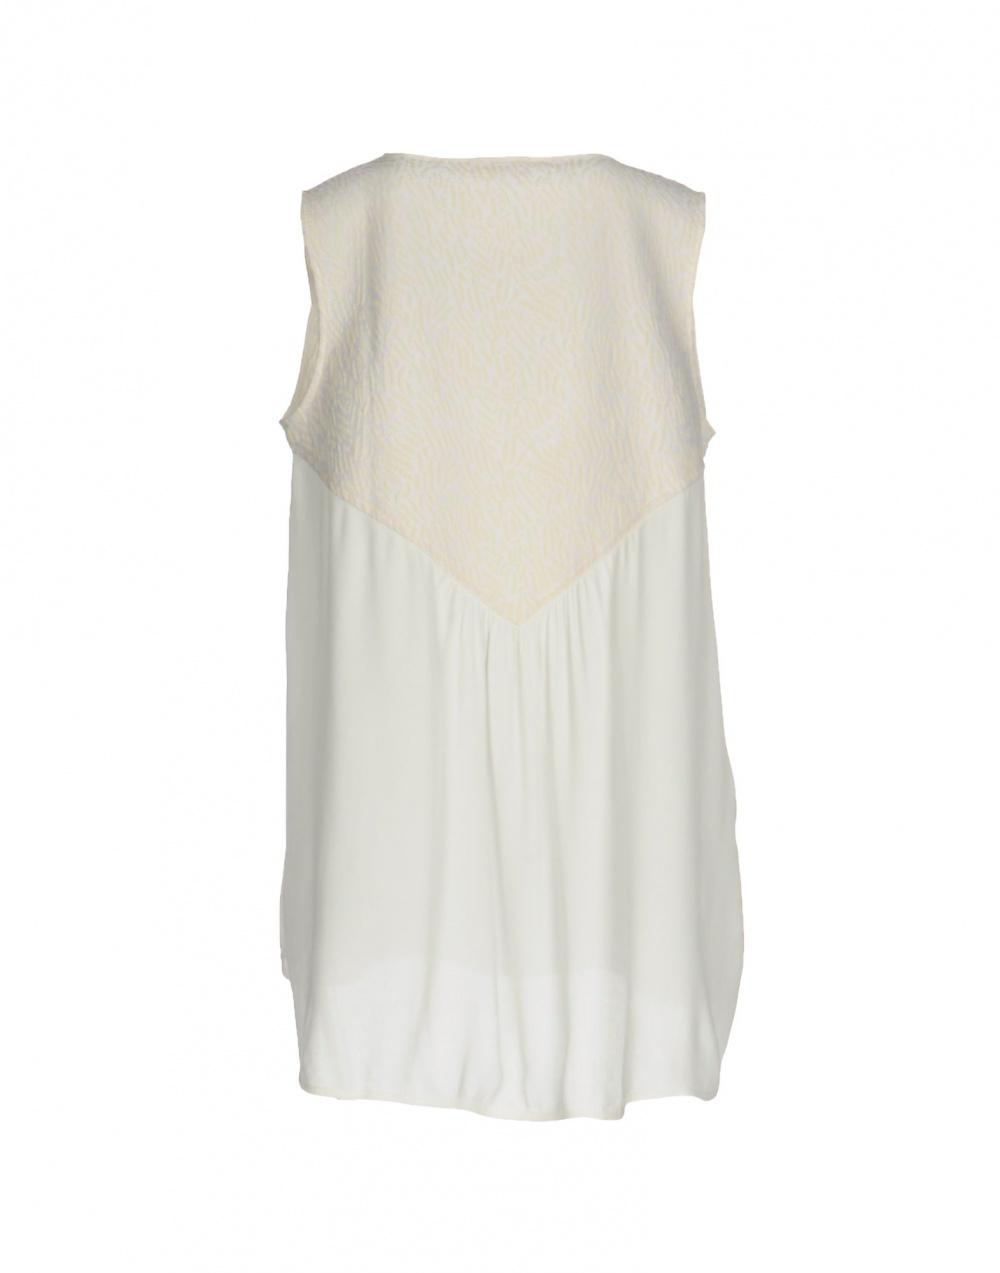 Топ блузка SITA MURT 46 размер